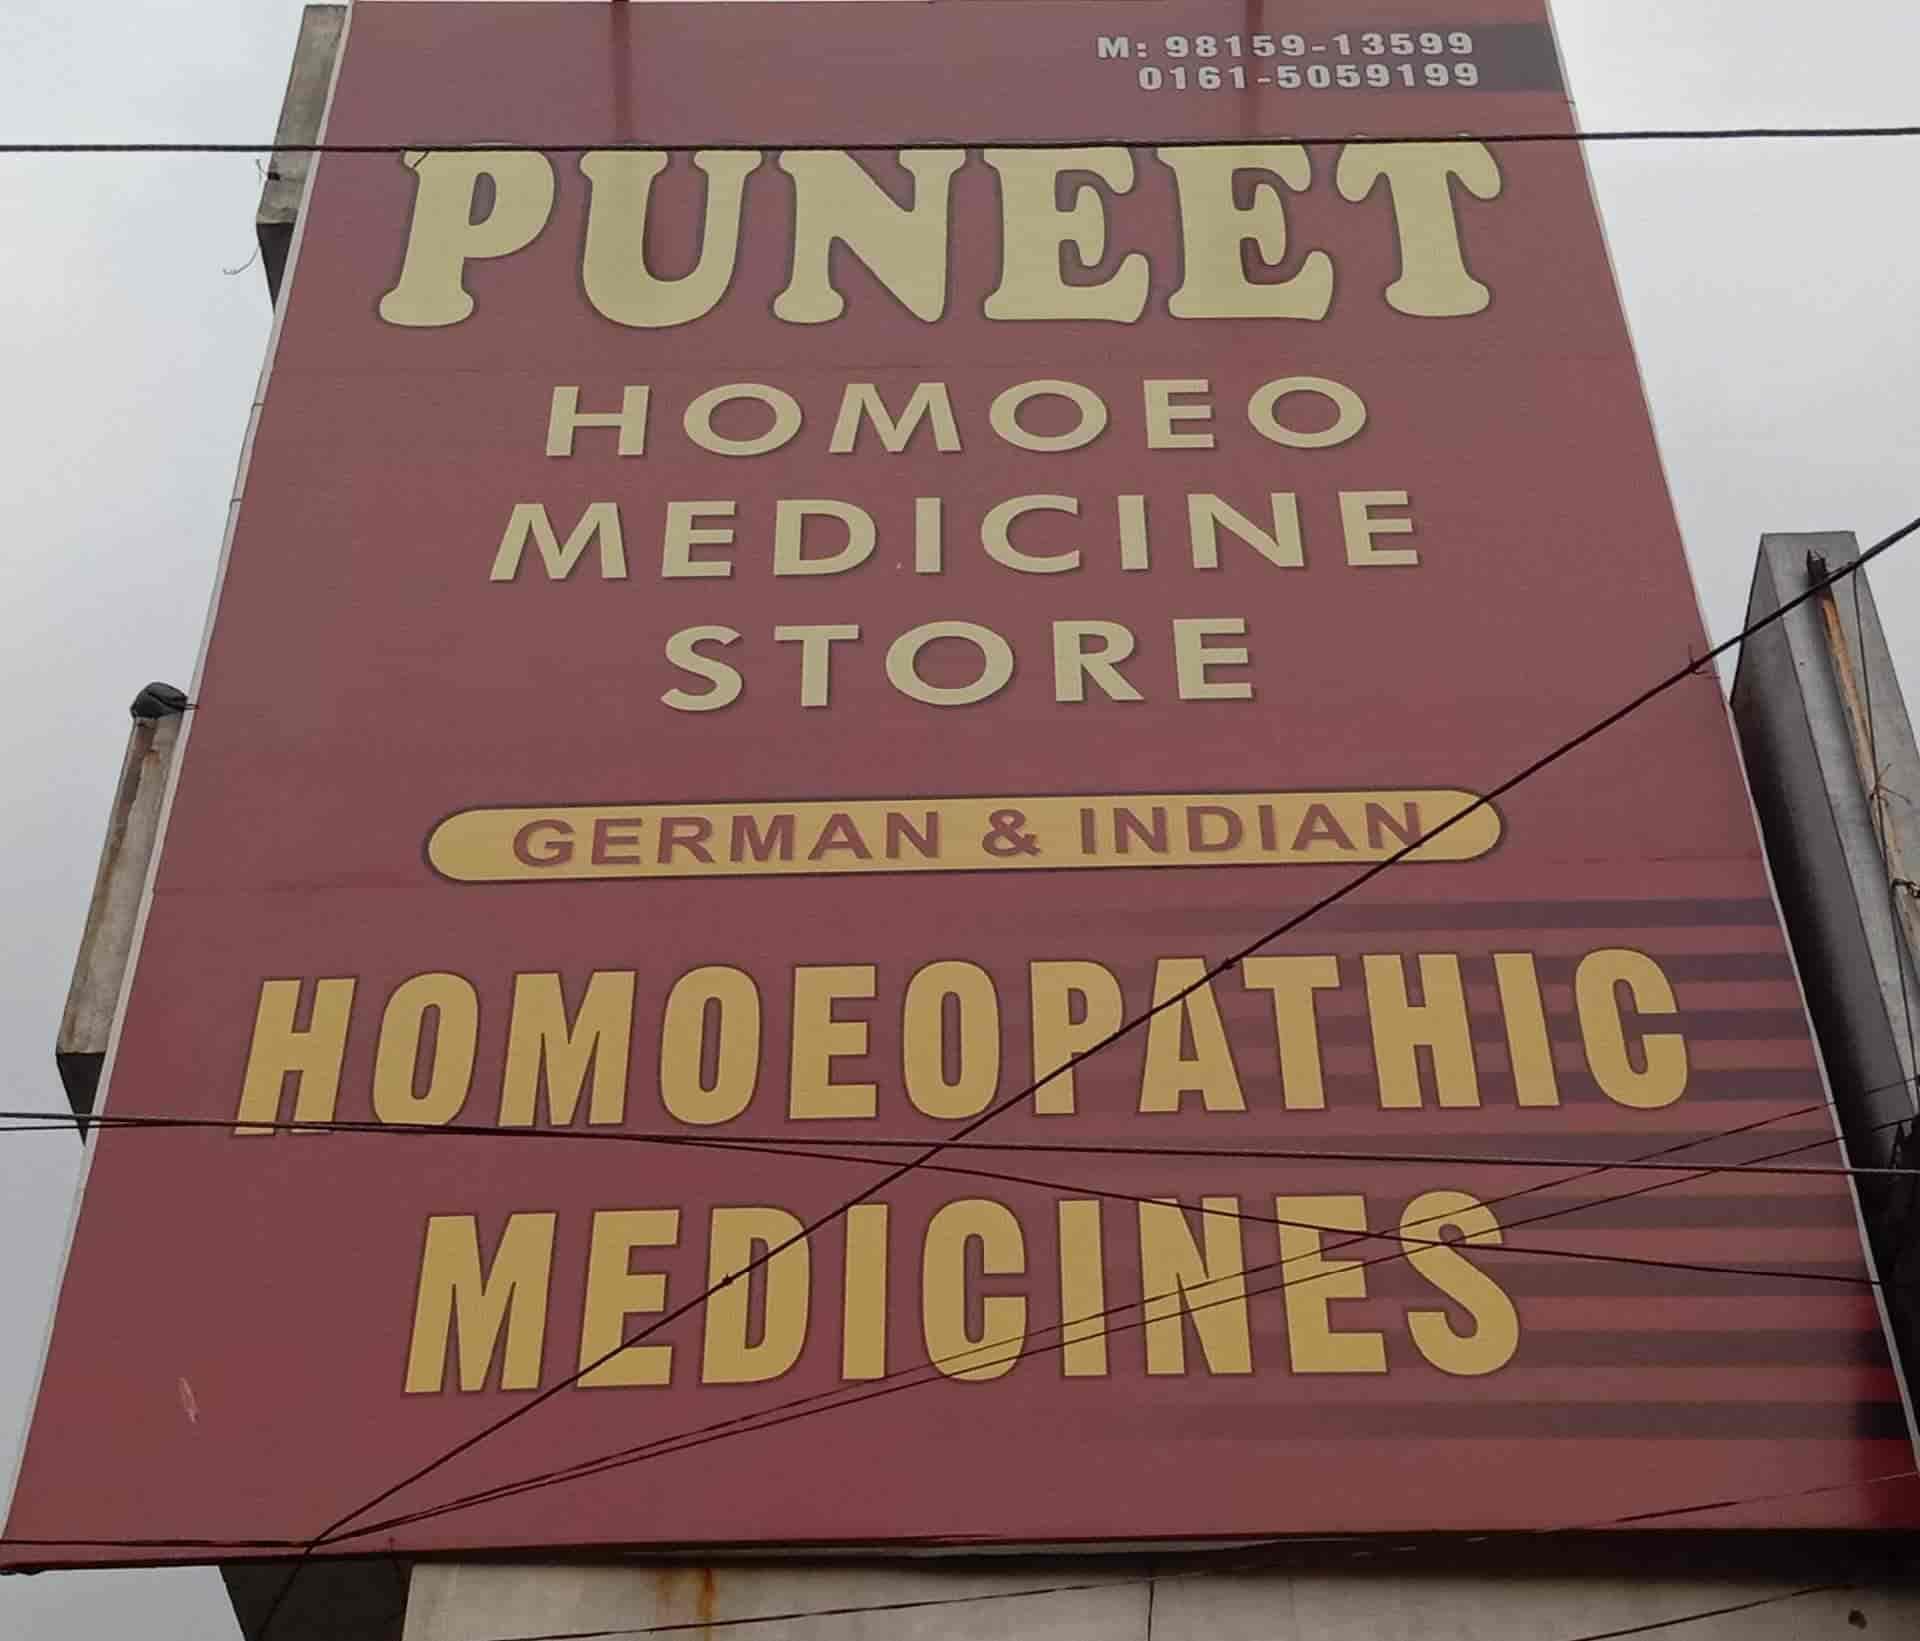 Puneet Homeo Medicine Store, Model Gram - Chemists in